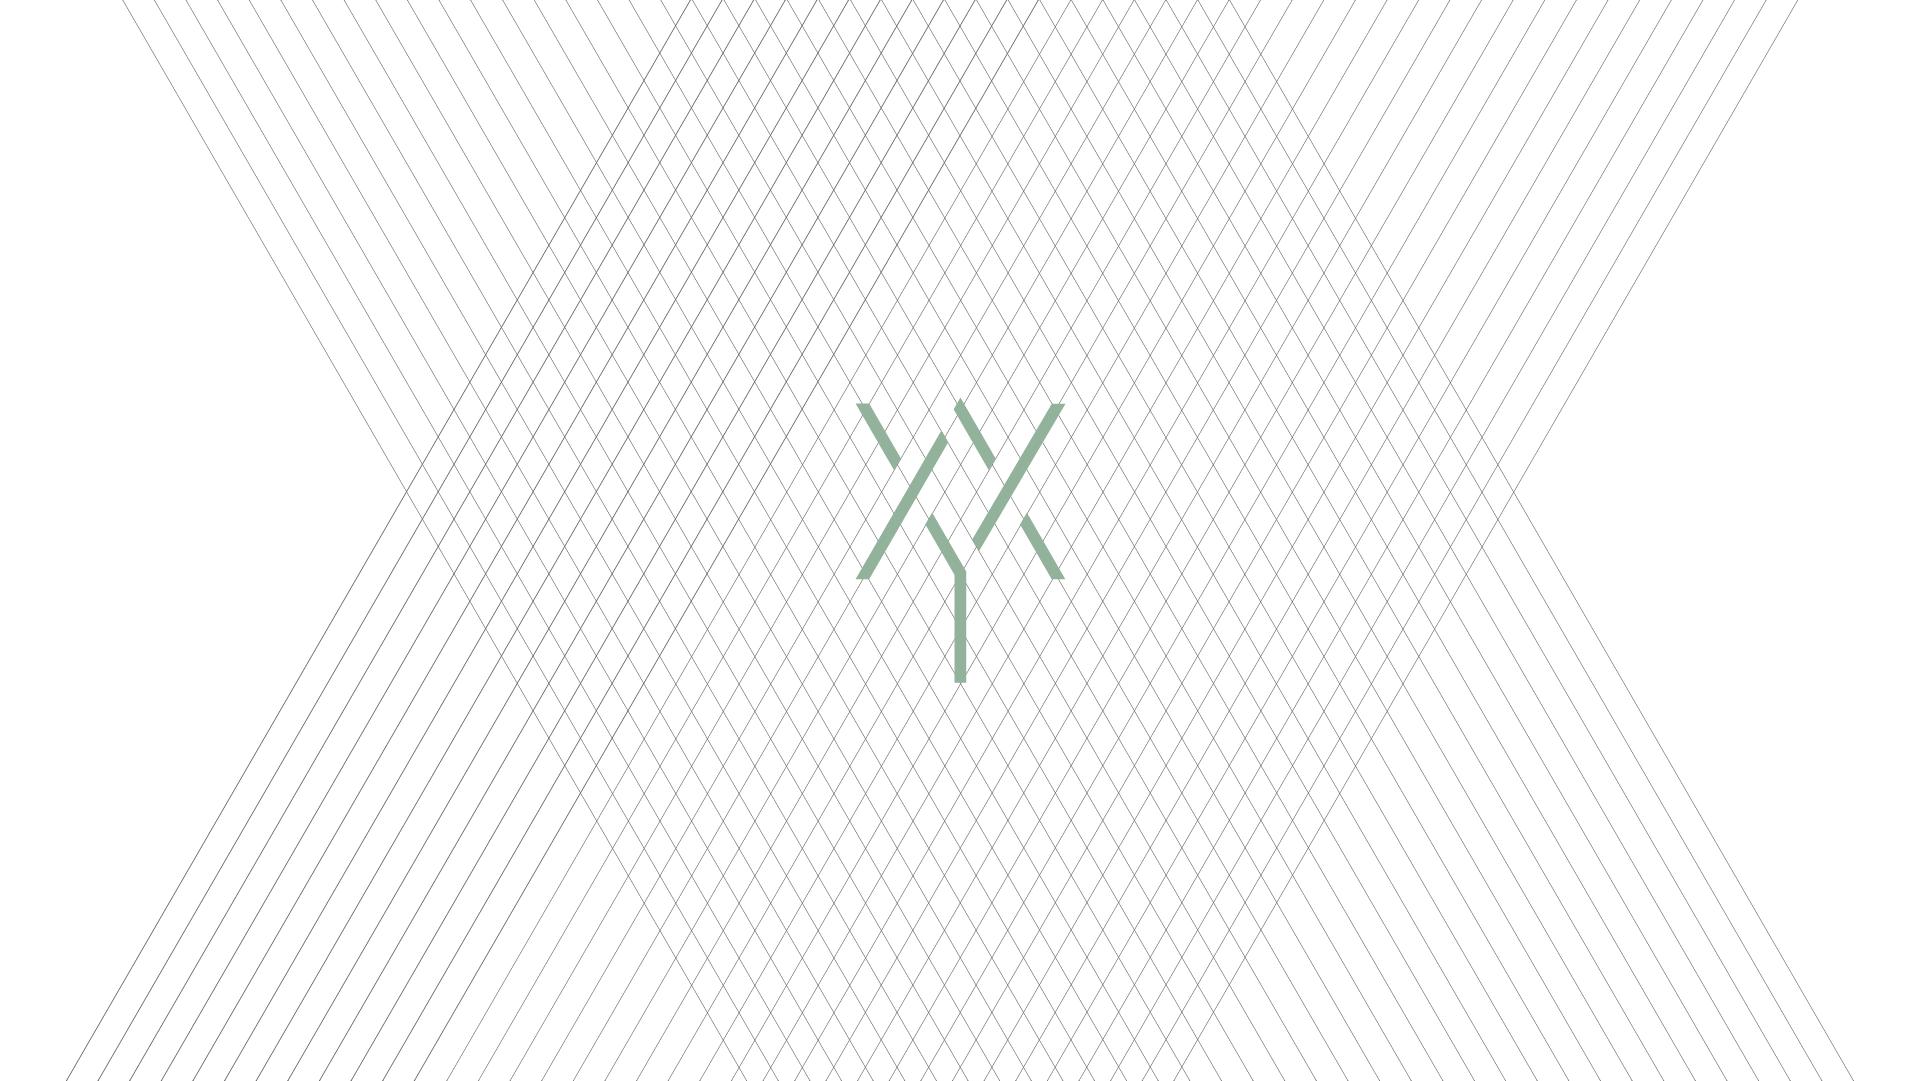 Art of Yoga logo on a grid